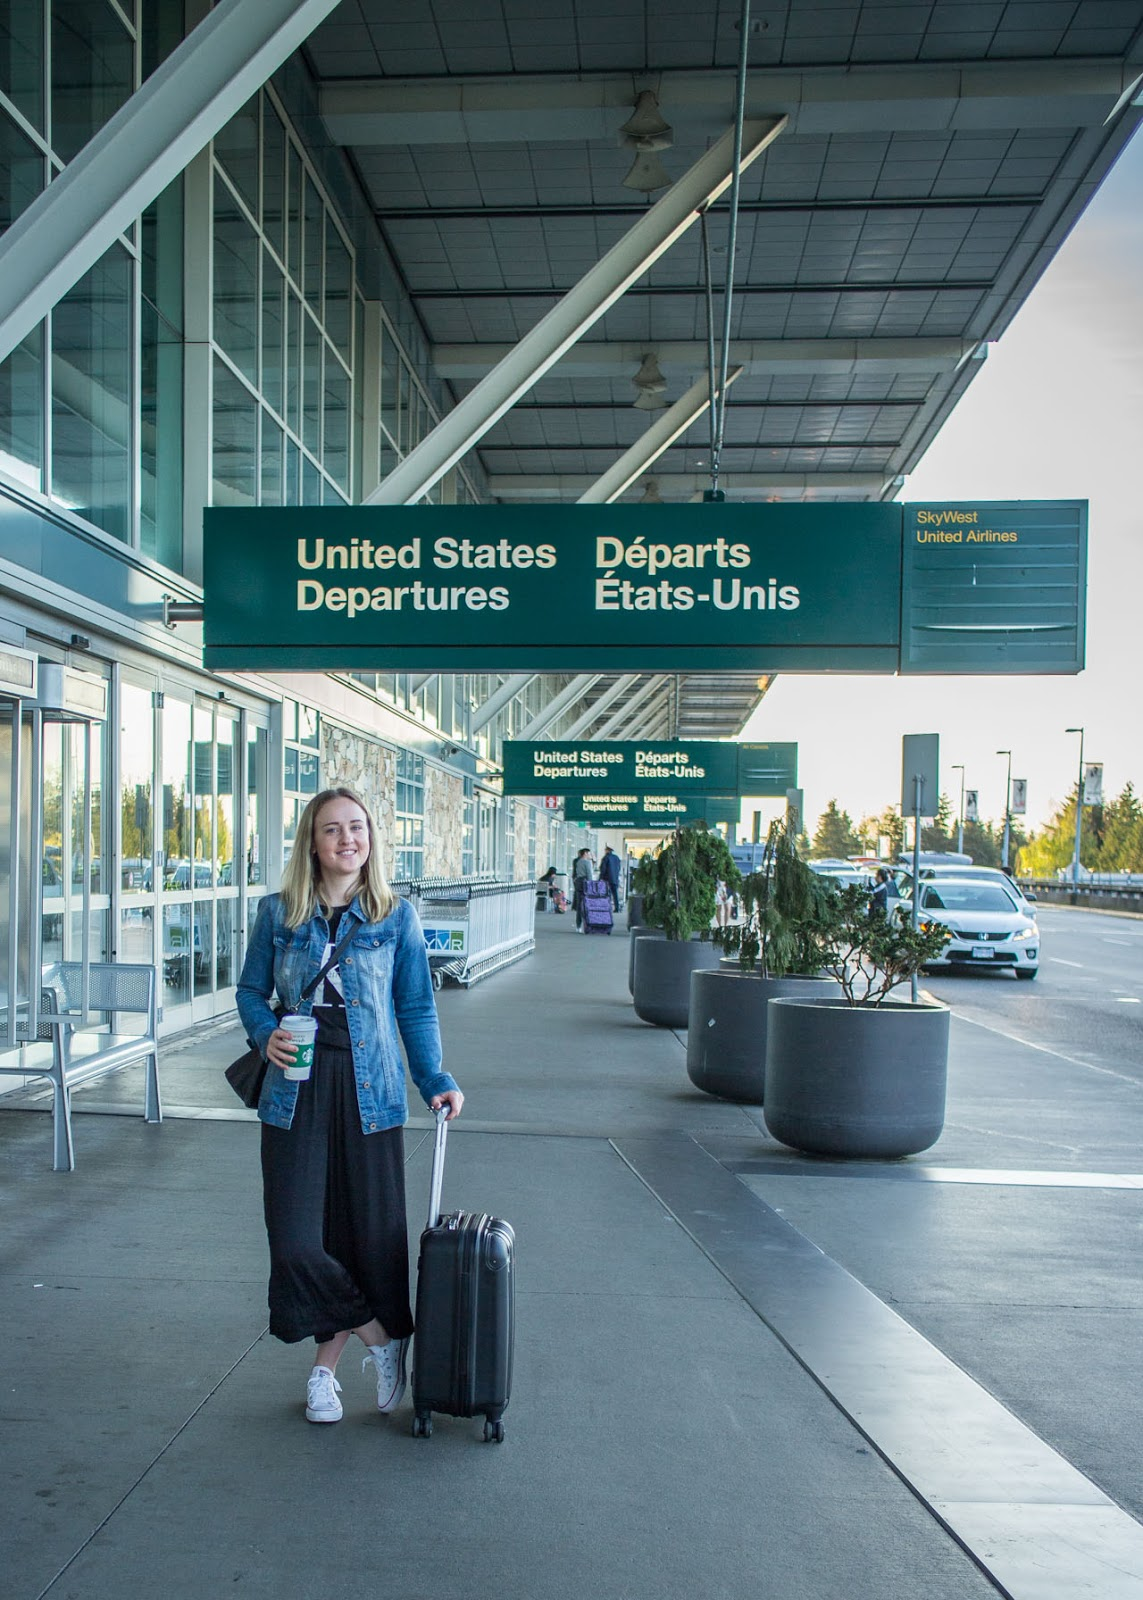 Travel - In My Dreams - Airplane photos - California - Long Beach - Vacation